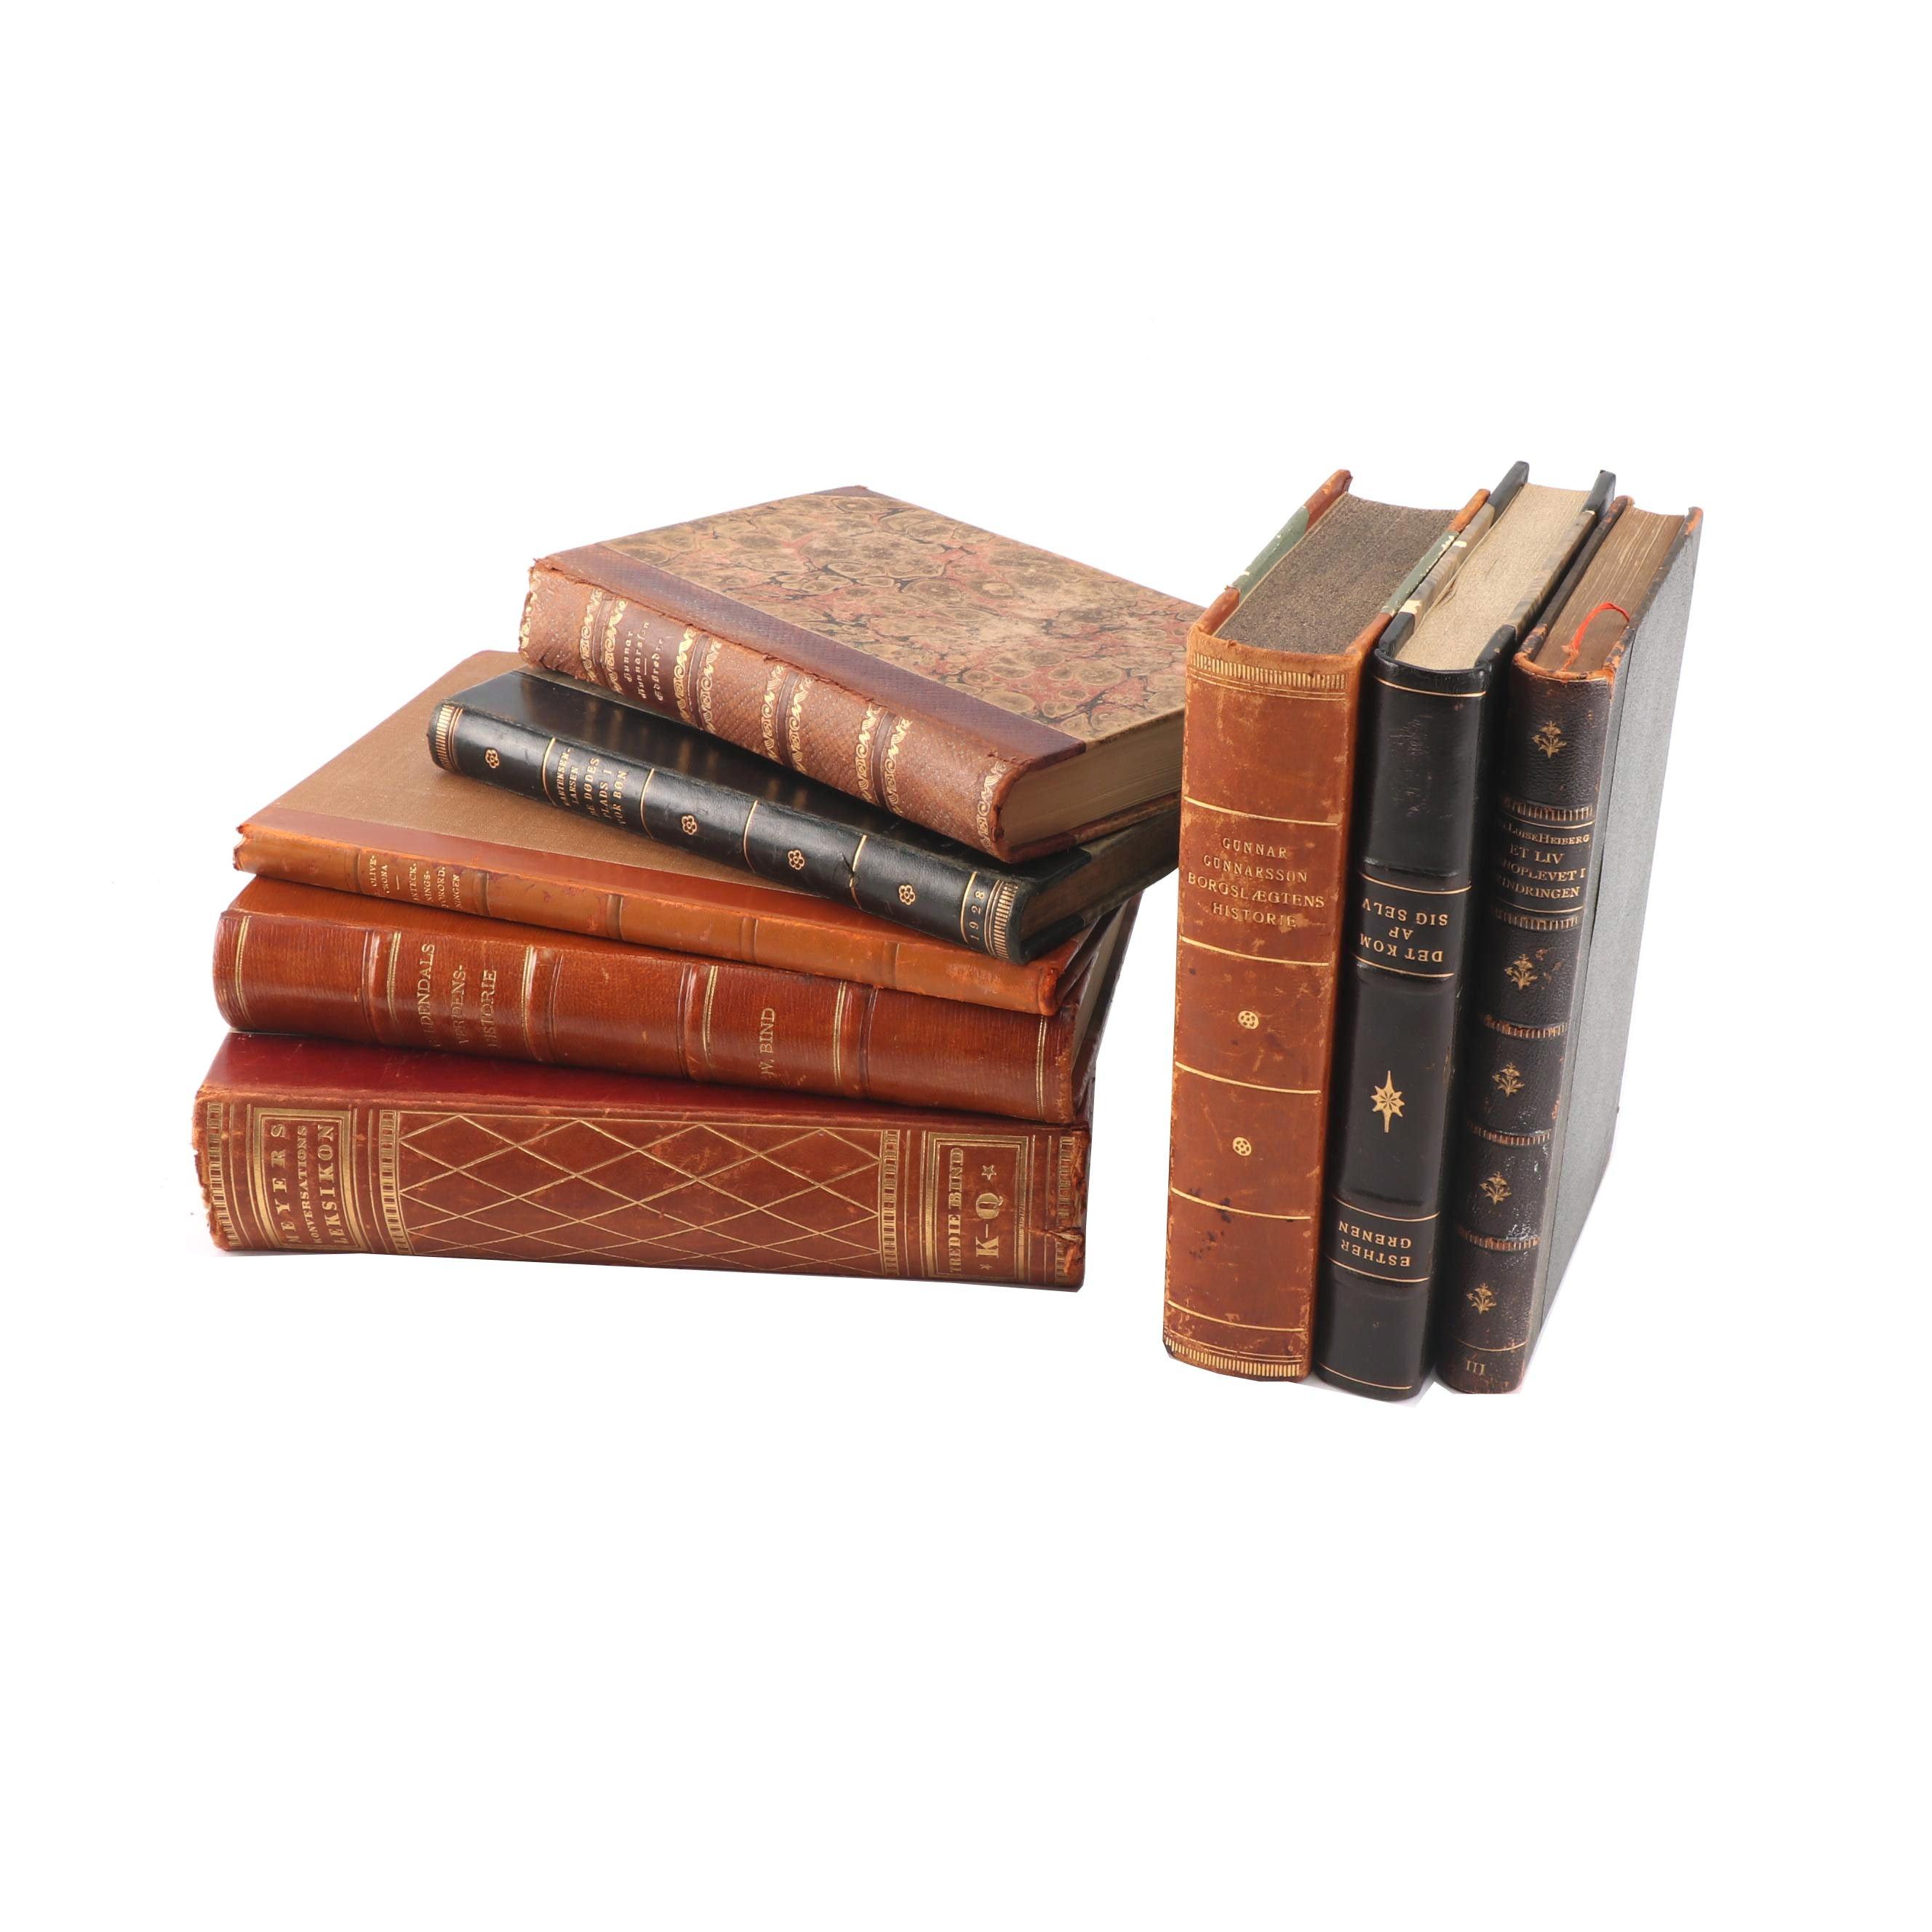 "1928 ""Borgslægtens Historie"" by Gunnar Gunnarsson and Other Books"